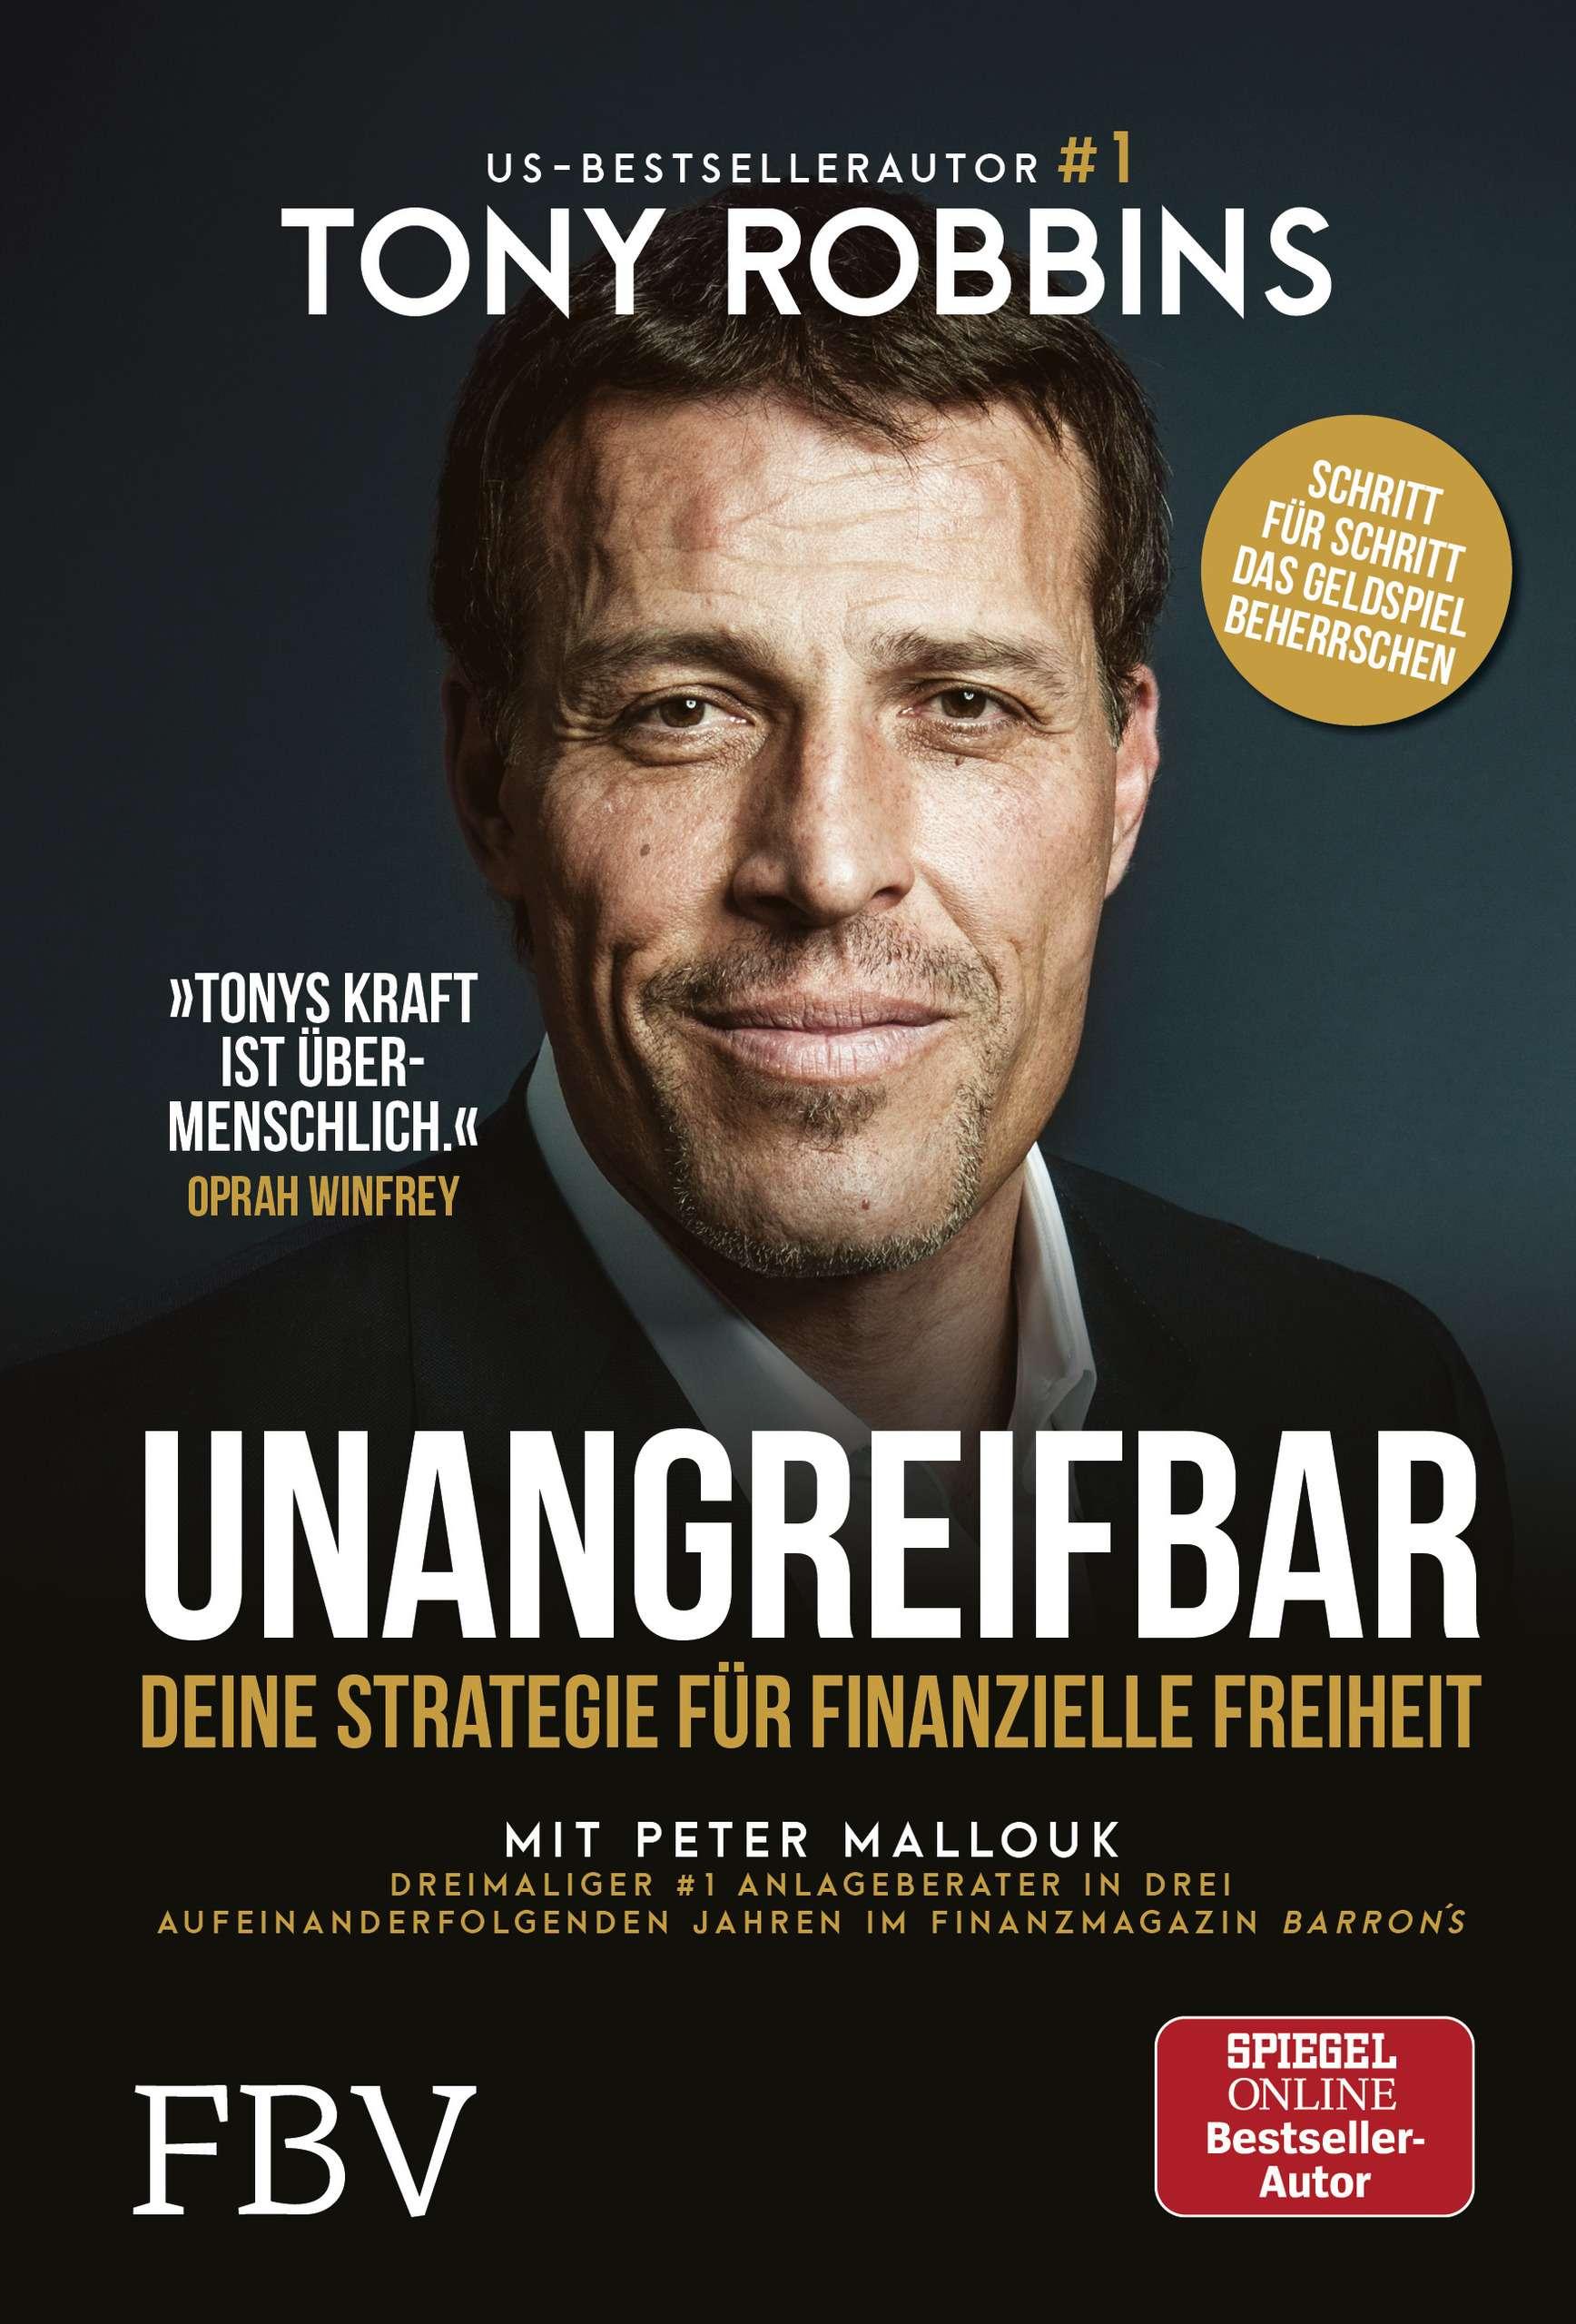 """Unangreifbar"" von Tony Robbins & Peter Mallouk © FVB Yogannetteblog.de"